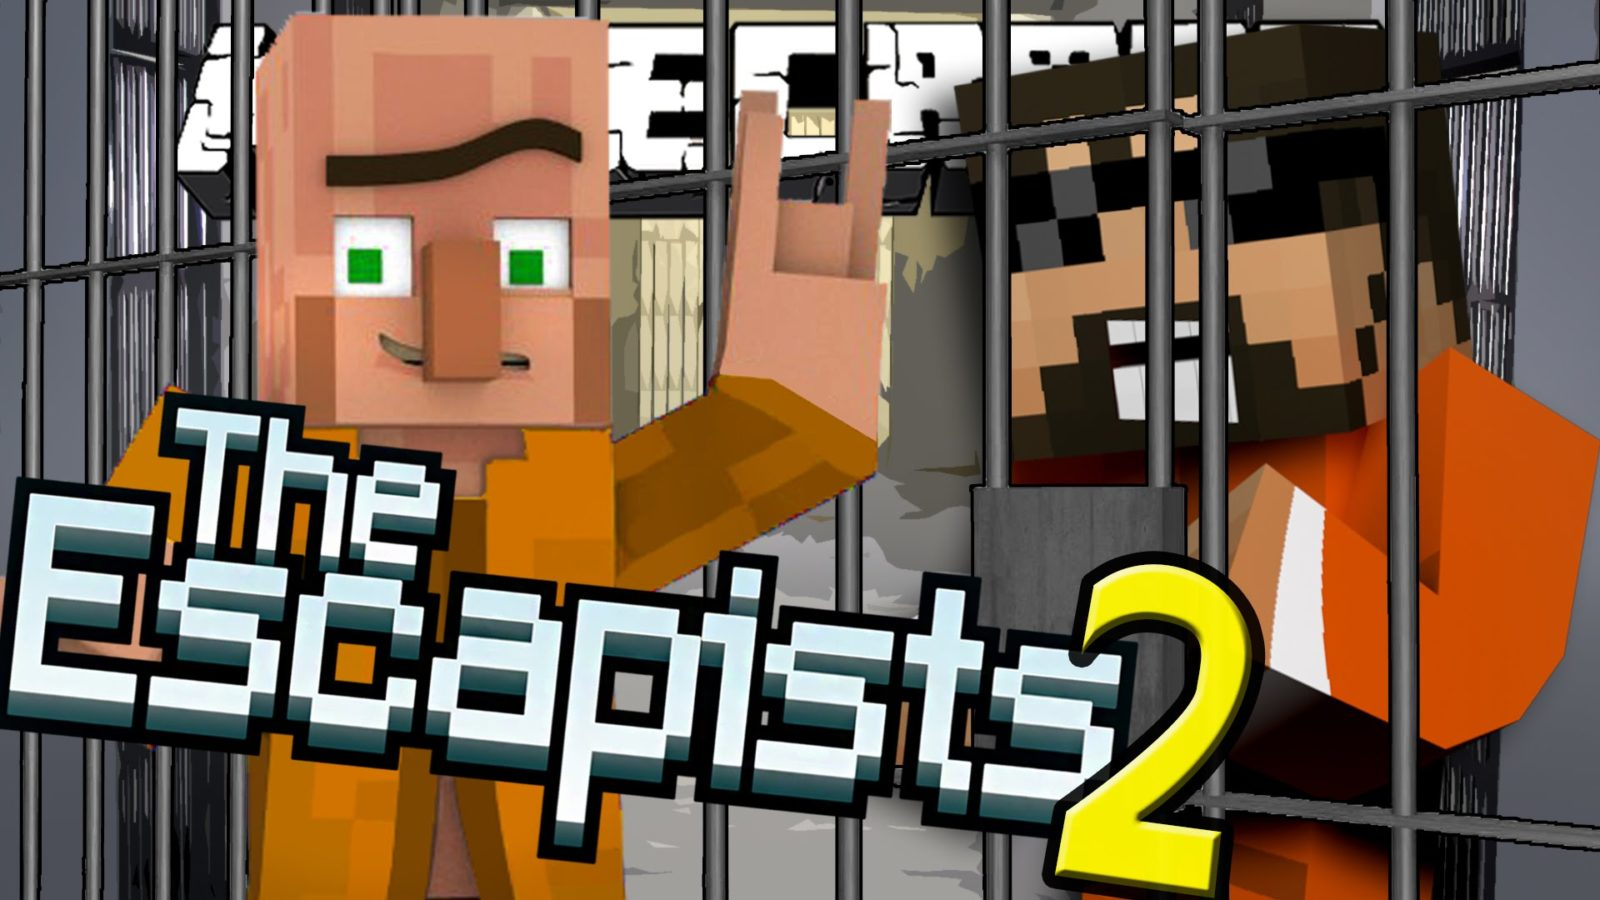 escapists2